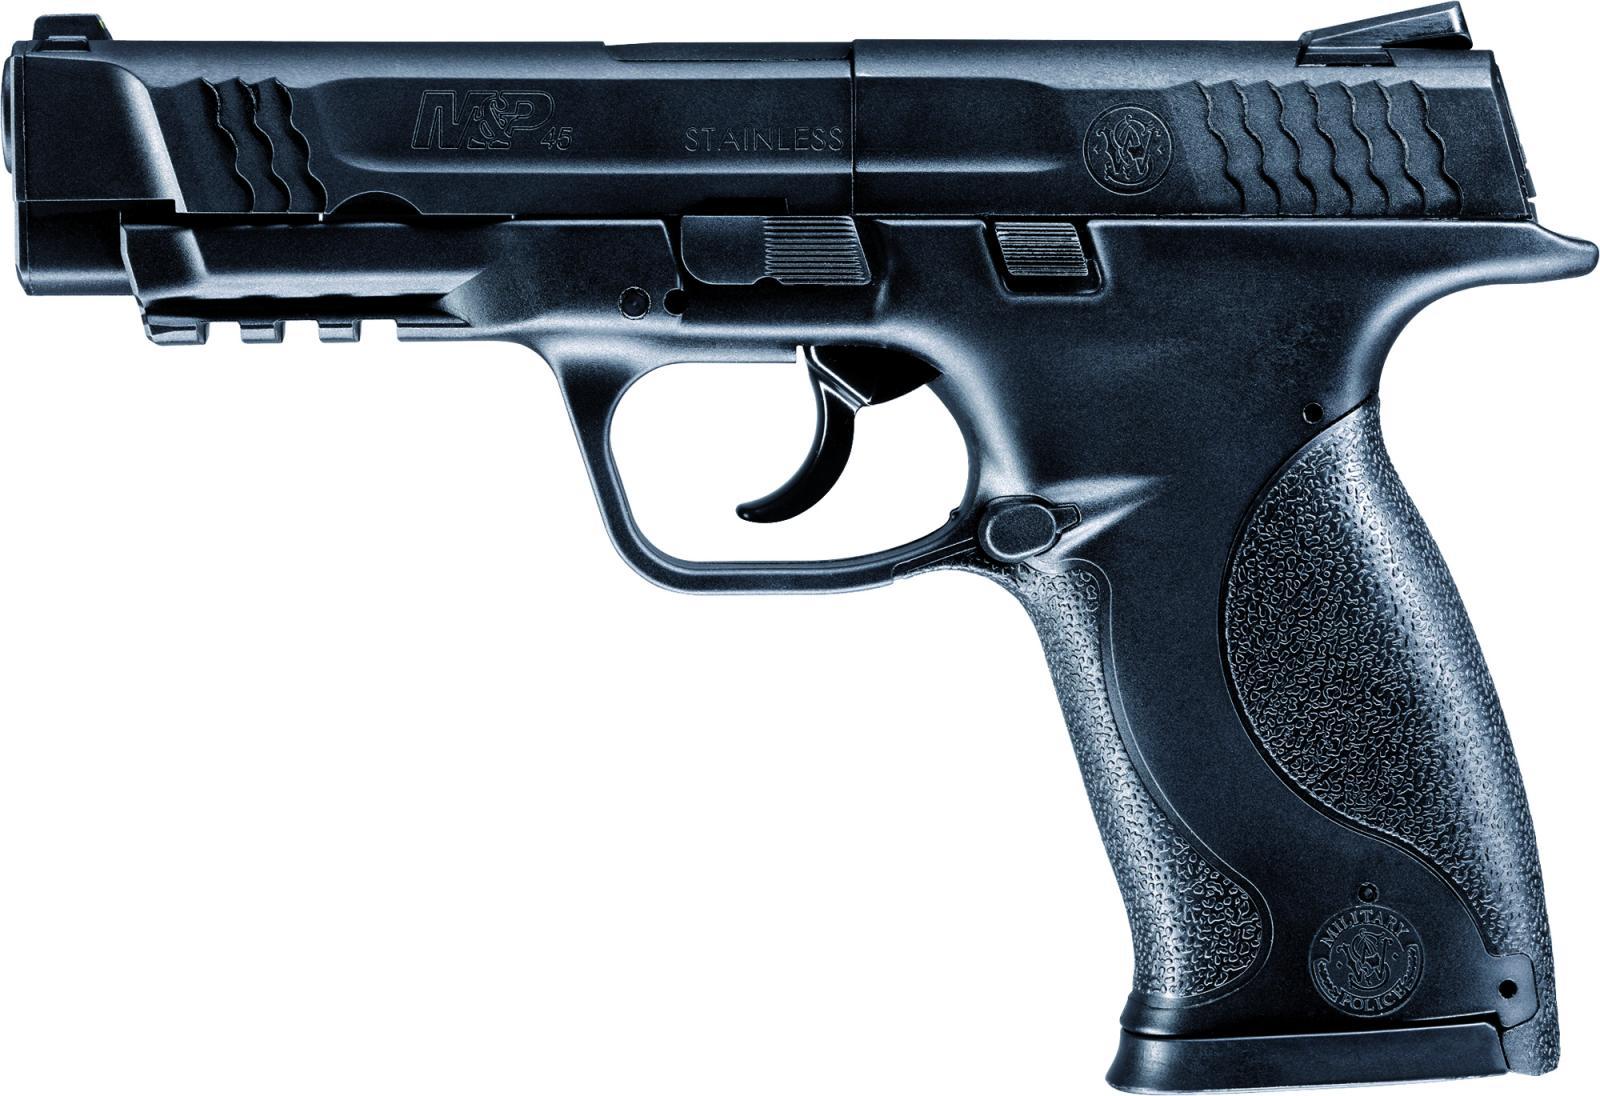 Pistolet à plomb SMITH & WESSON MP45 CO2 cal. 4.5 mm